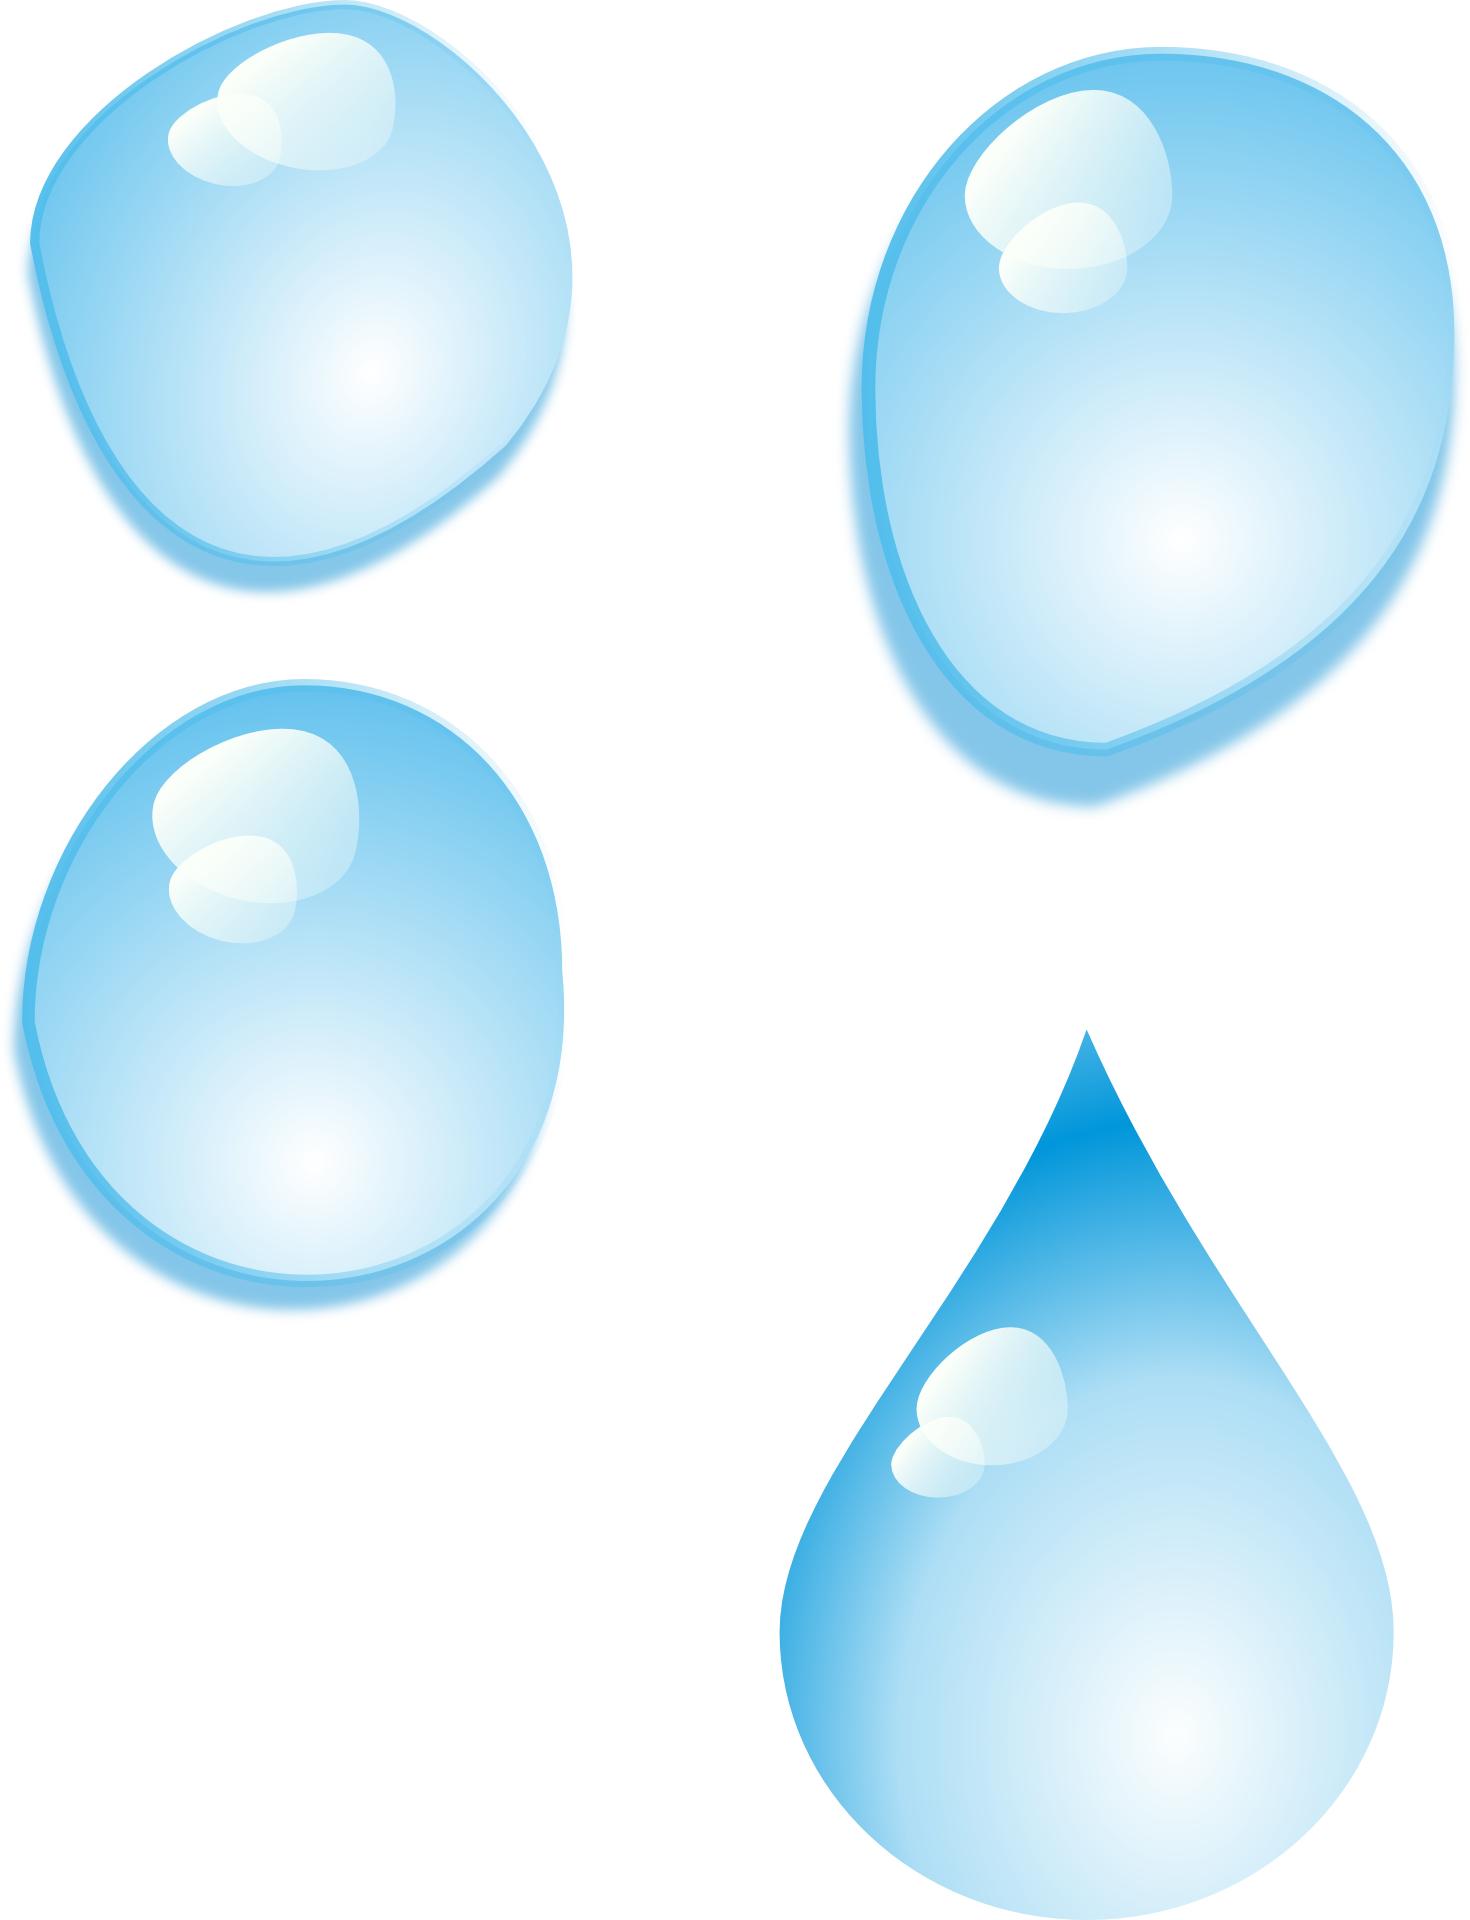 Raindrops Falling On Flowers Wallpaper 15 Raindrop Hd Psd Images Water Drop Desktop Wallpaper